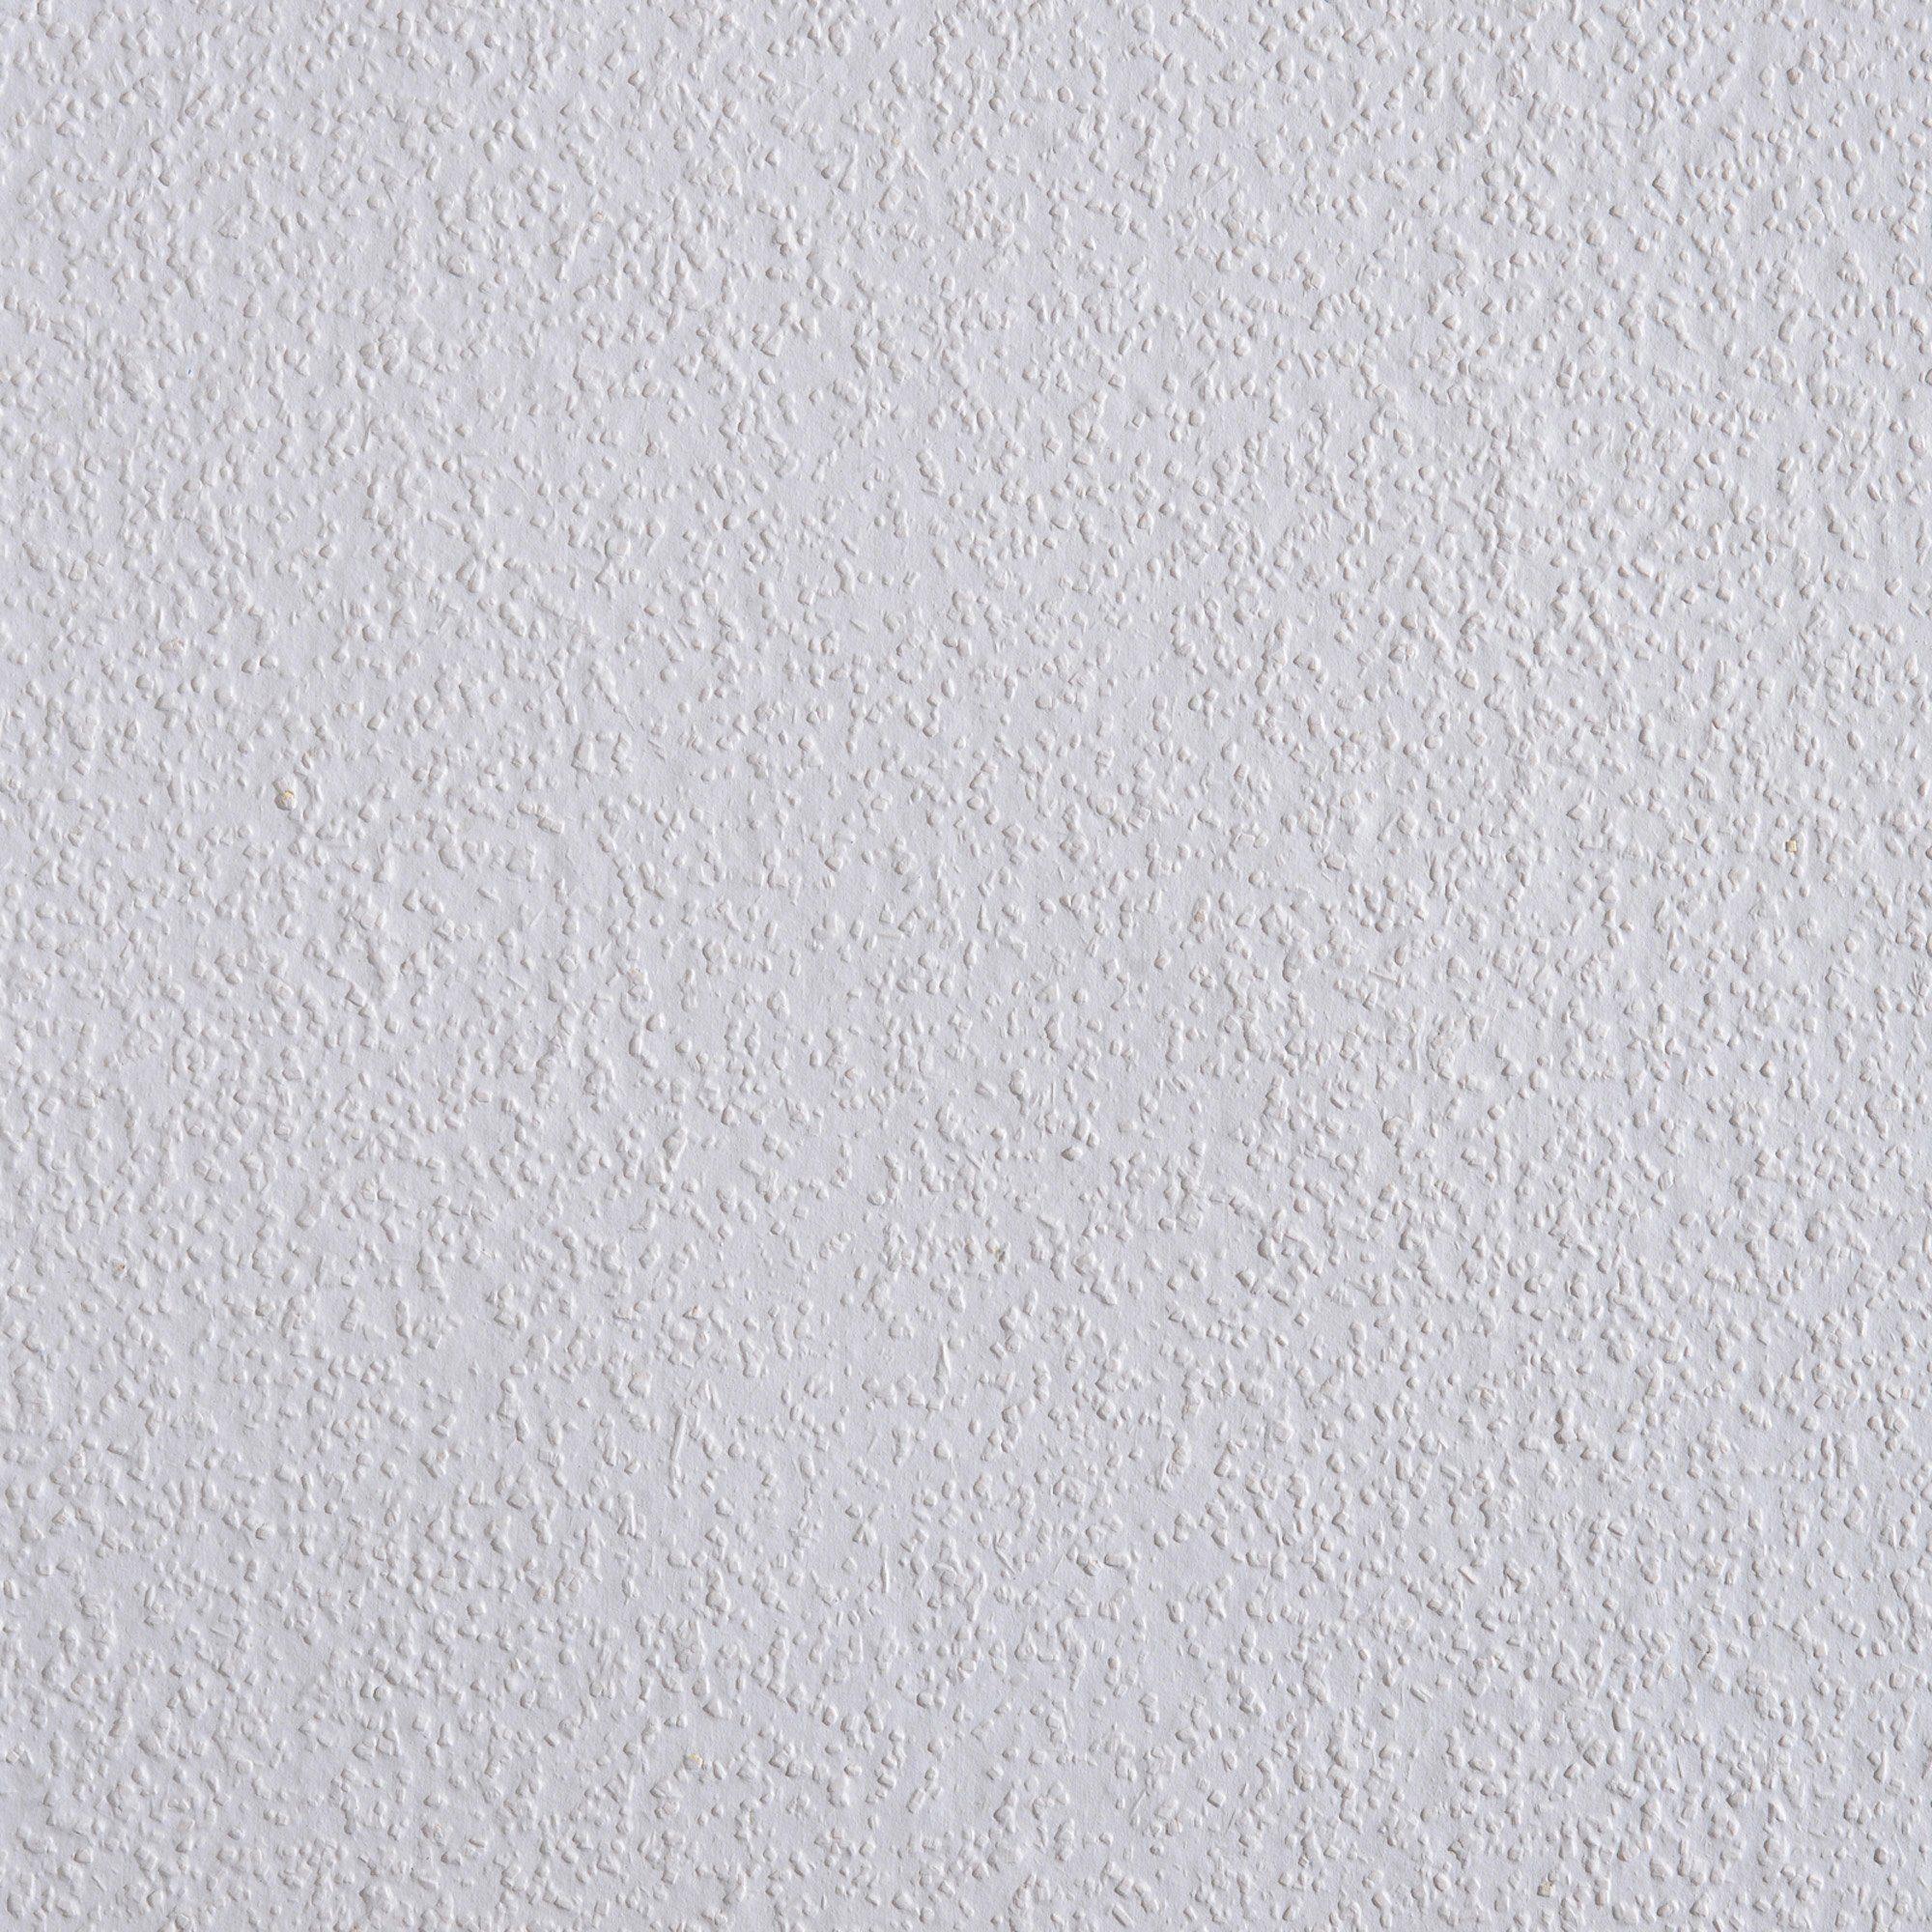 ERFURT Set: Papiertapete »Rauhfaser 70 Superkorn«, 1, 2 oder 6 Rolle